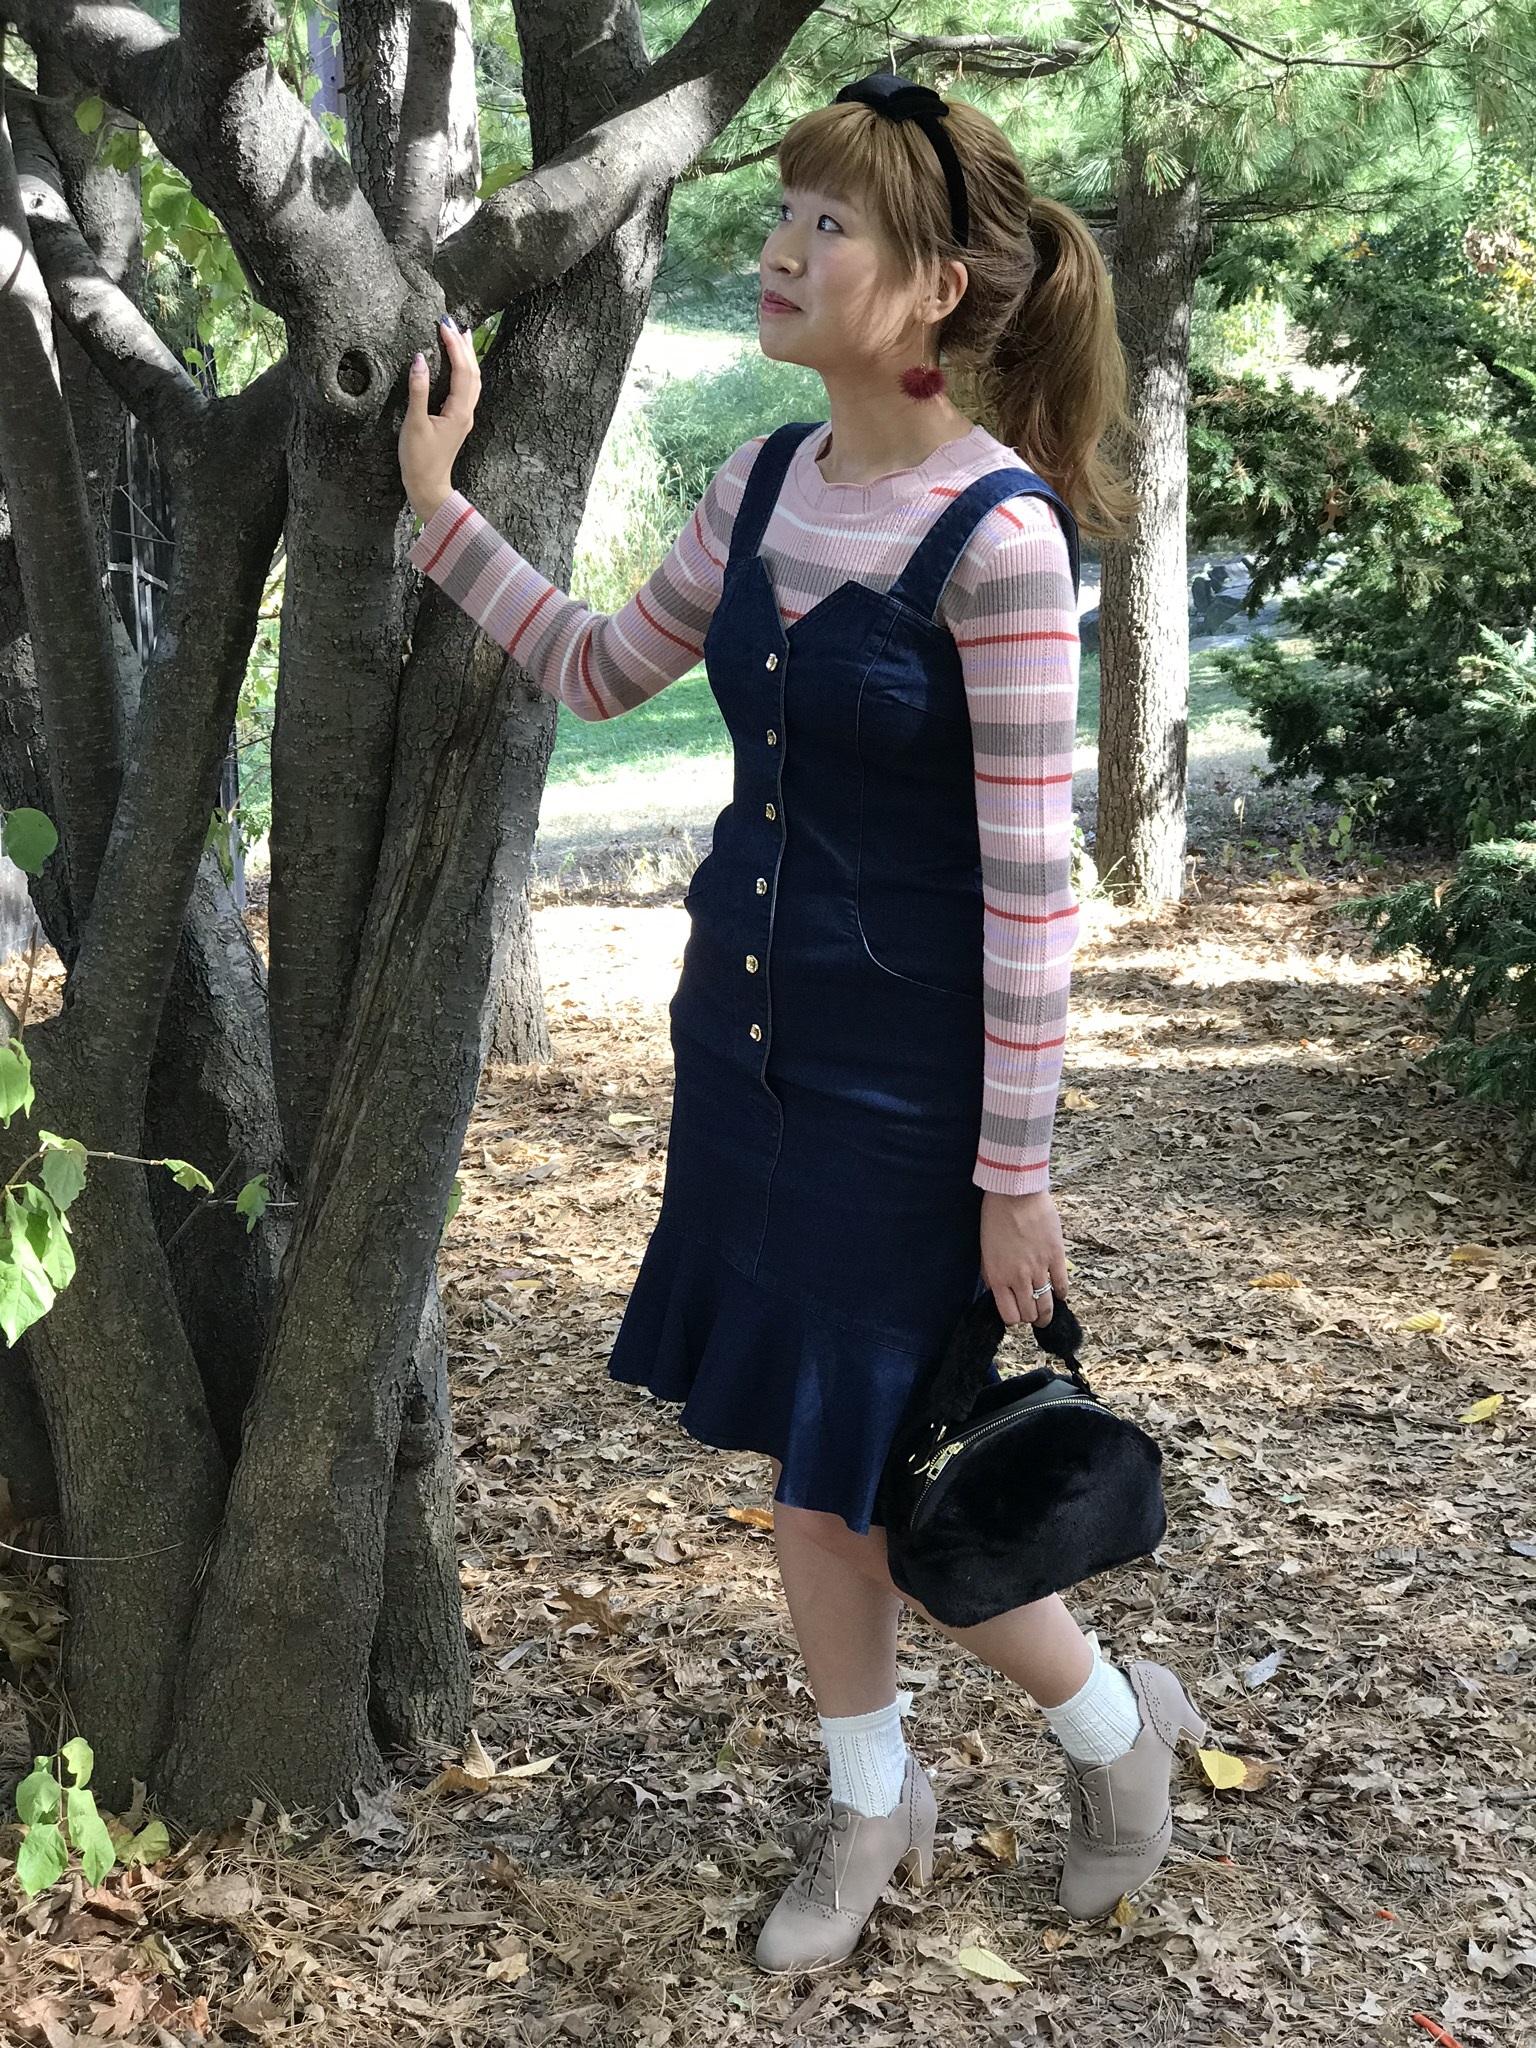 Top: dazzlin; dress: dazzlin; bag: MAJESTIC LEGON; headband: LODISPOTTO; shoes: LODISPOTTO; socks: tutuanna.